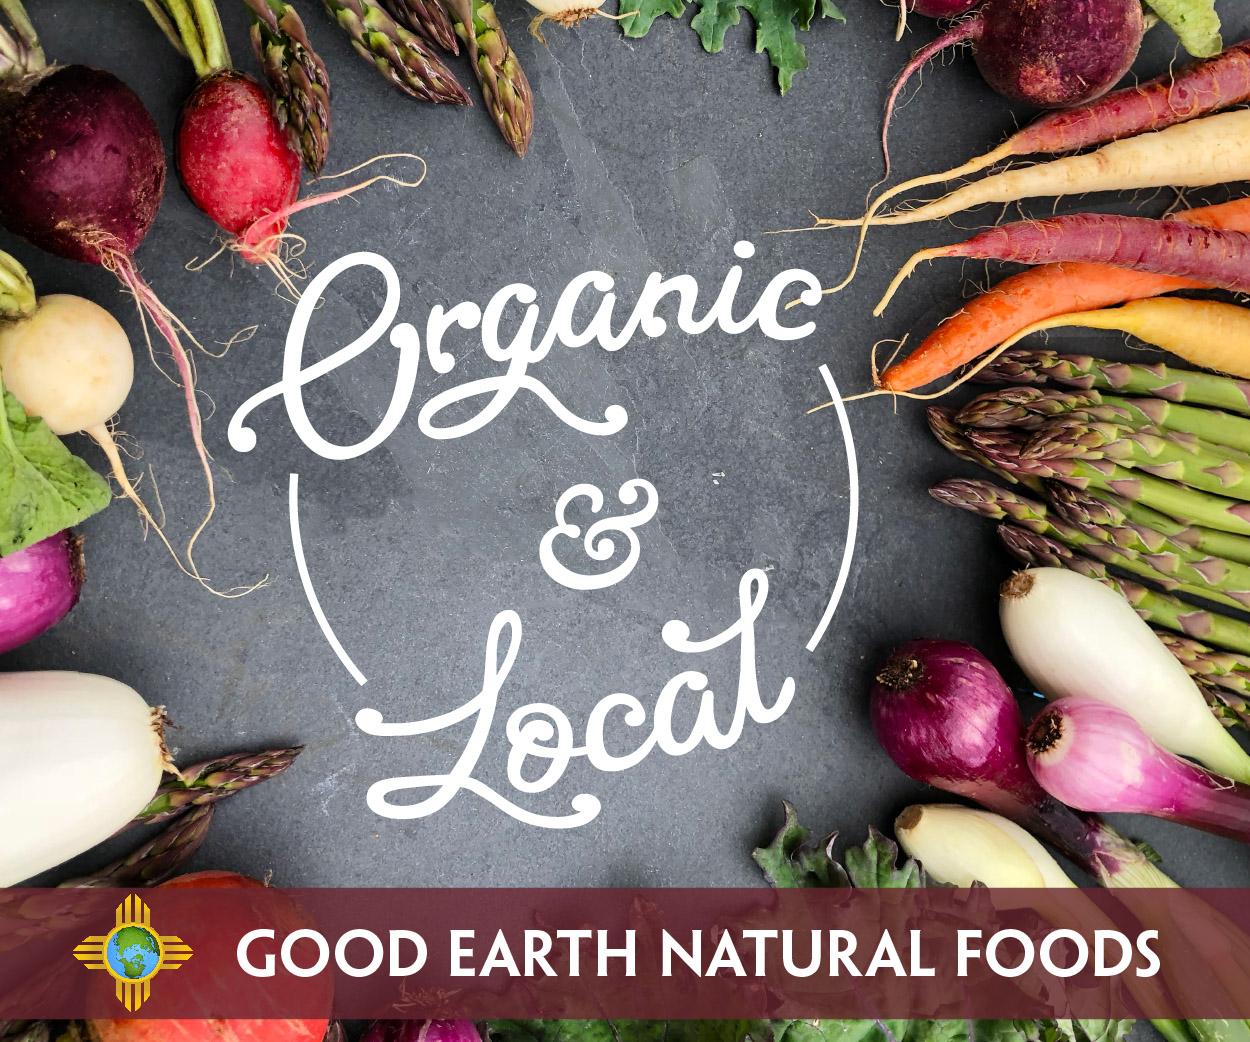 Organic-Local-ProMedia-Banners-300dpi-02.jpg